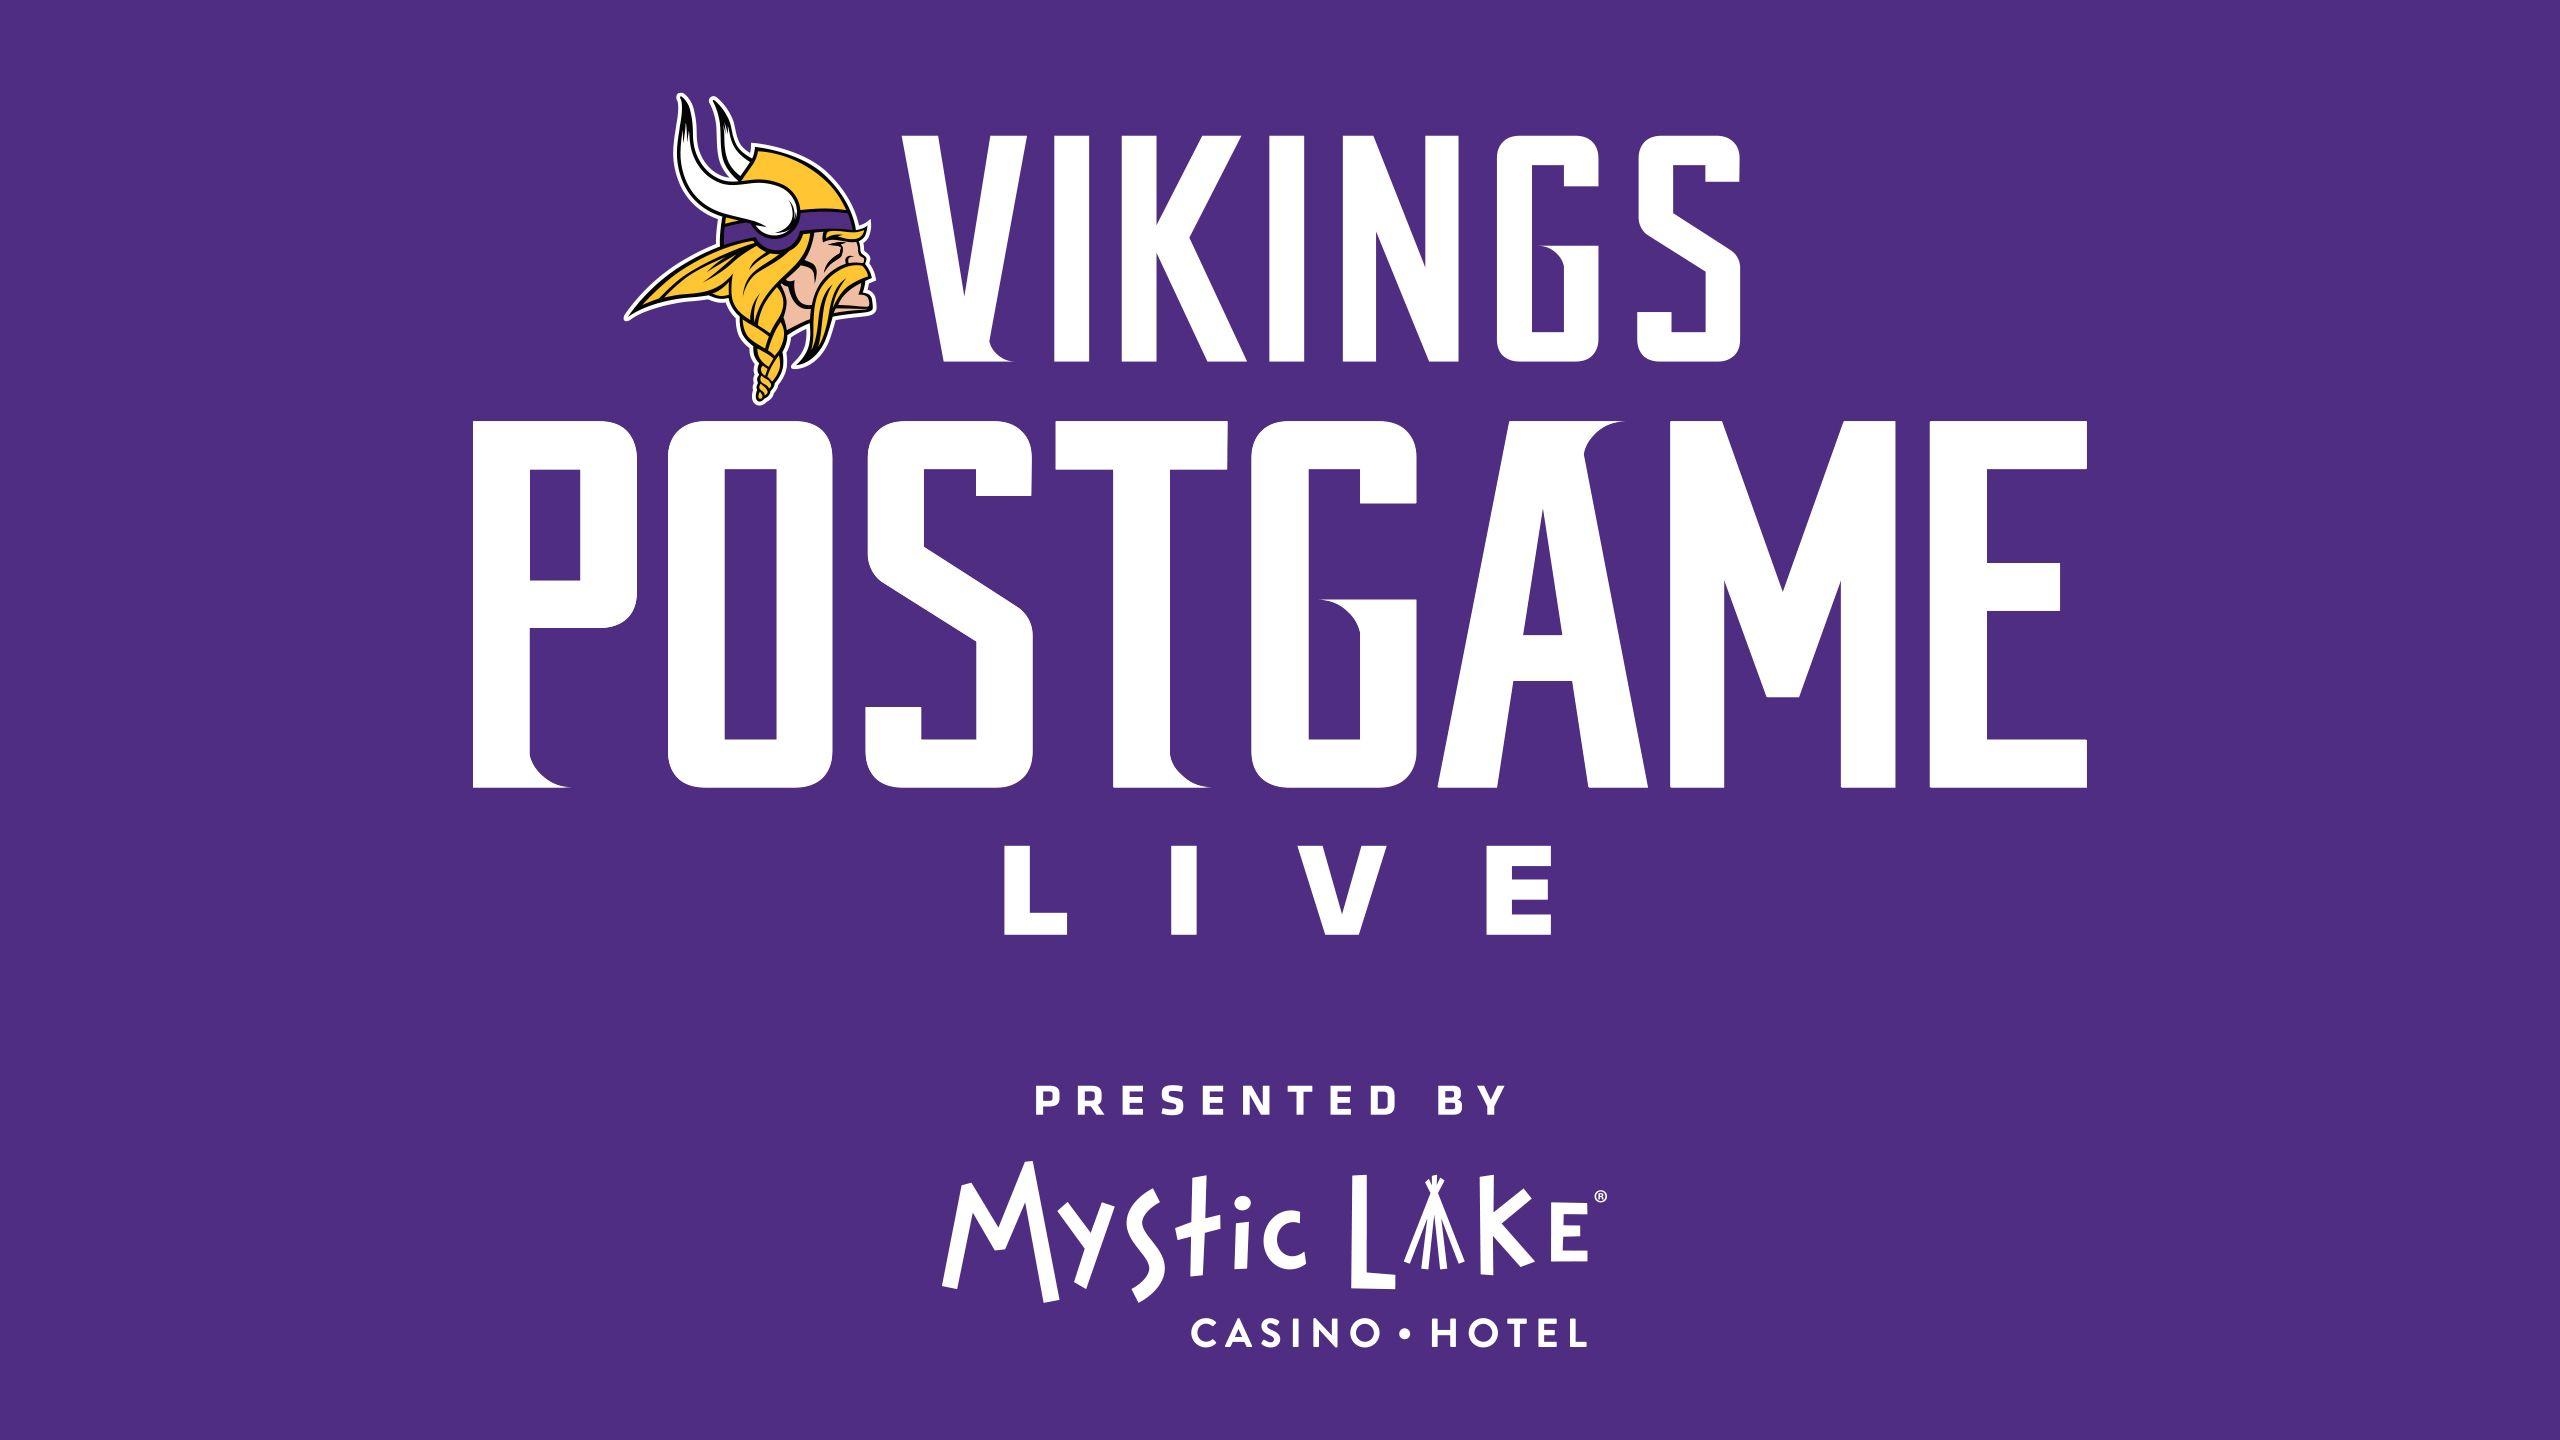 Vikings Postgame Live